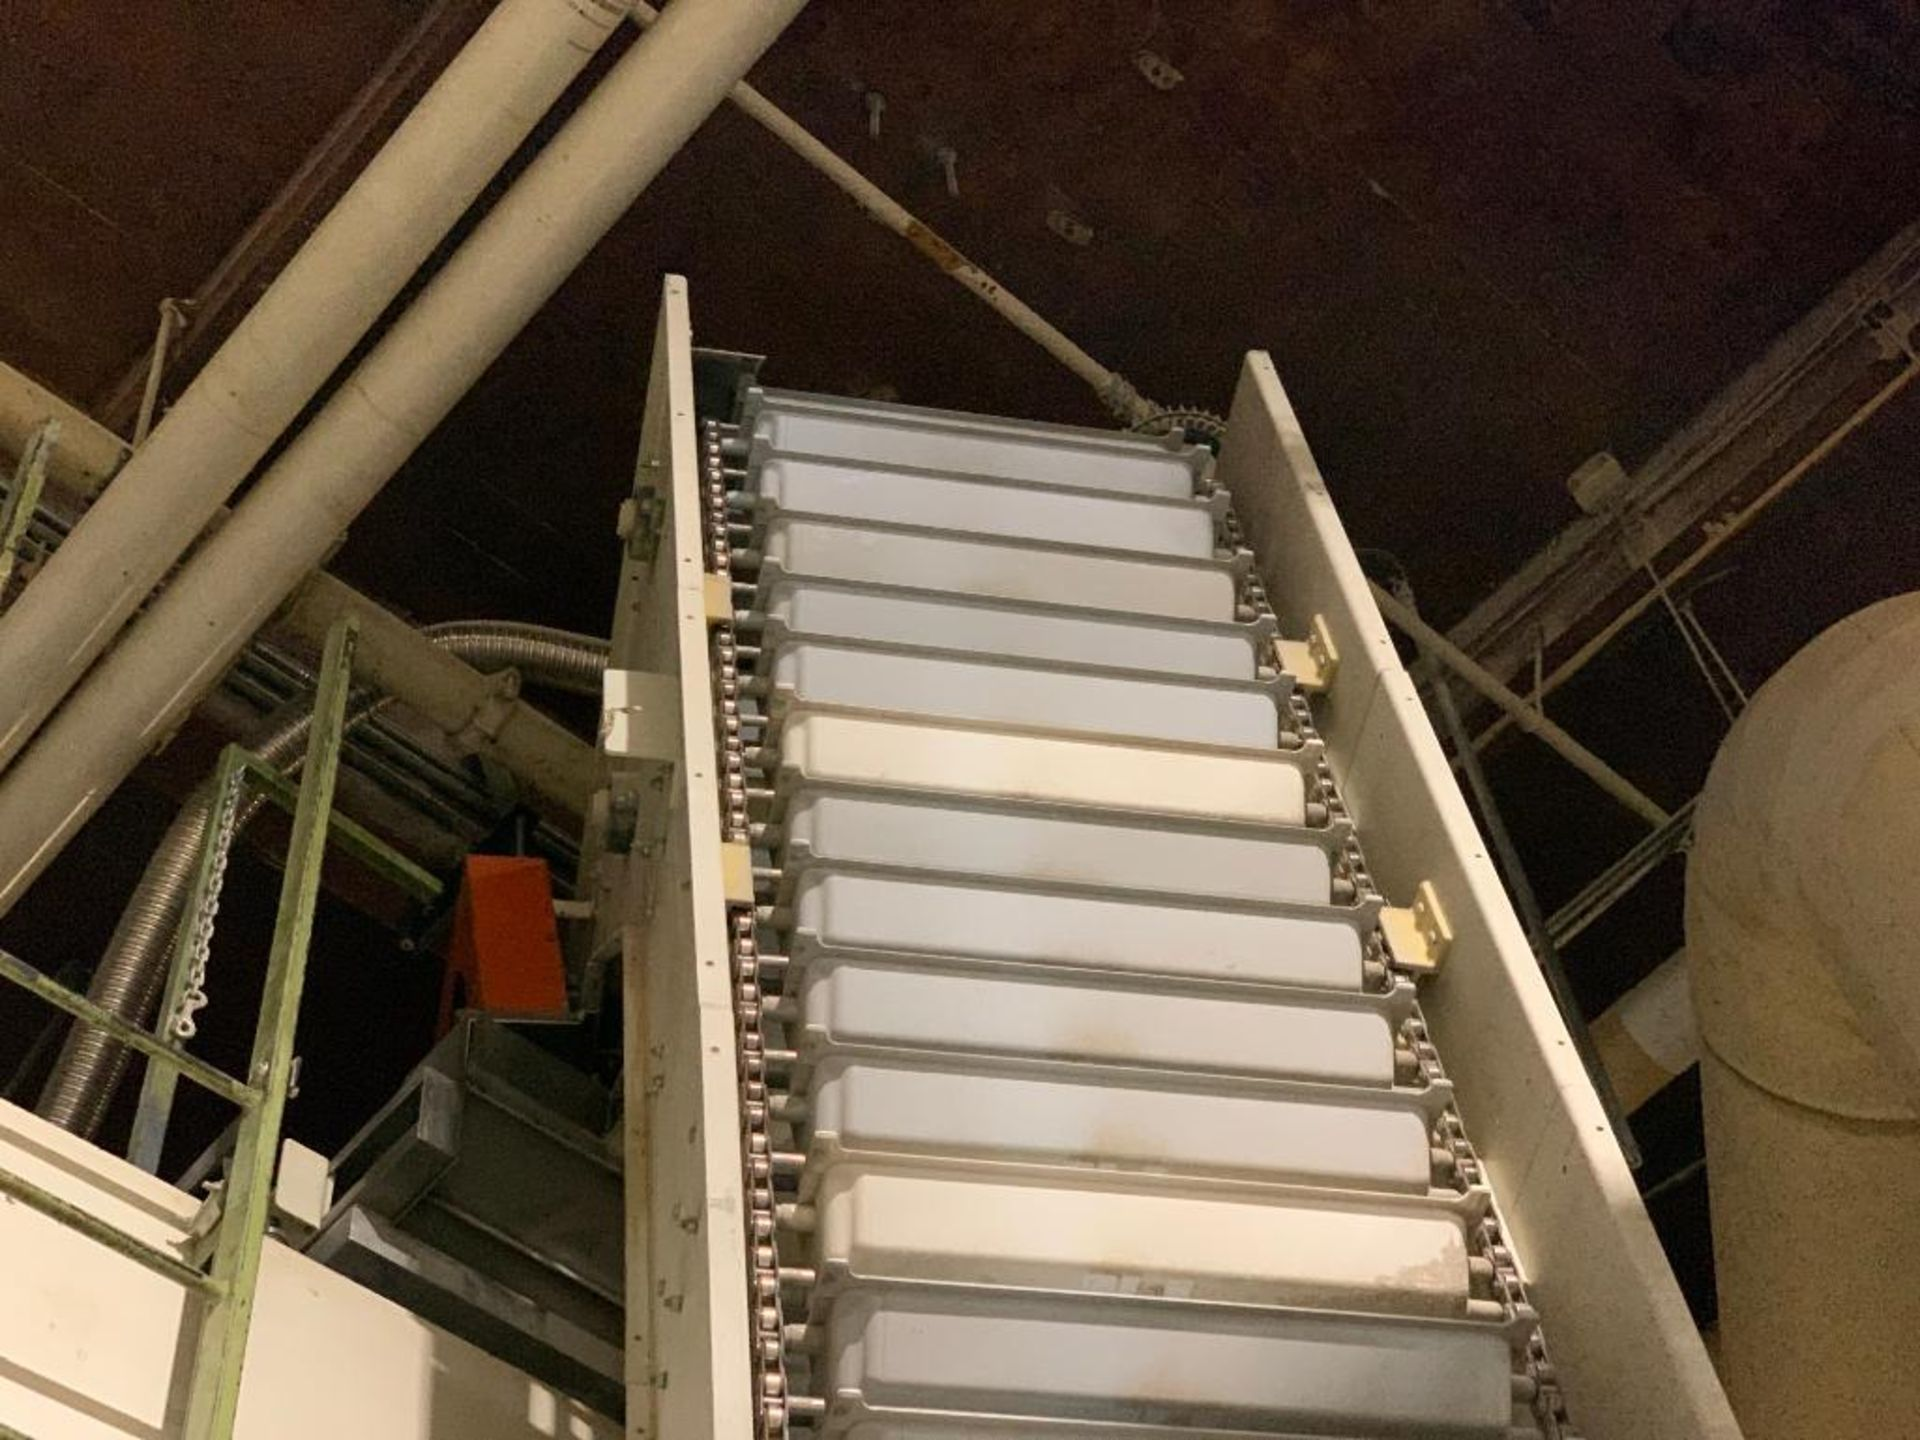 Meyer overlapping bucket elevator, model PA462-24-S - Image 5 of 14